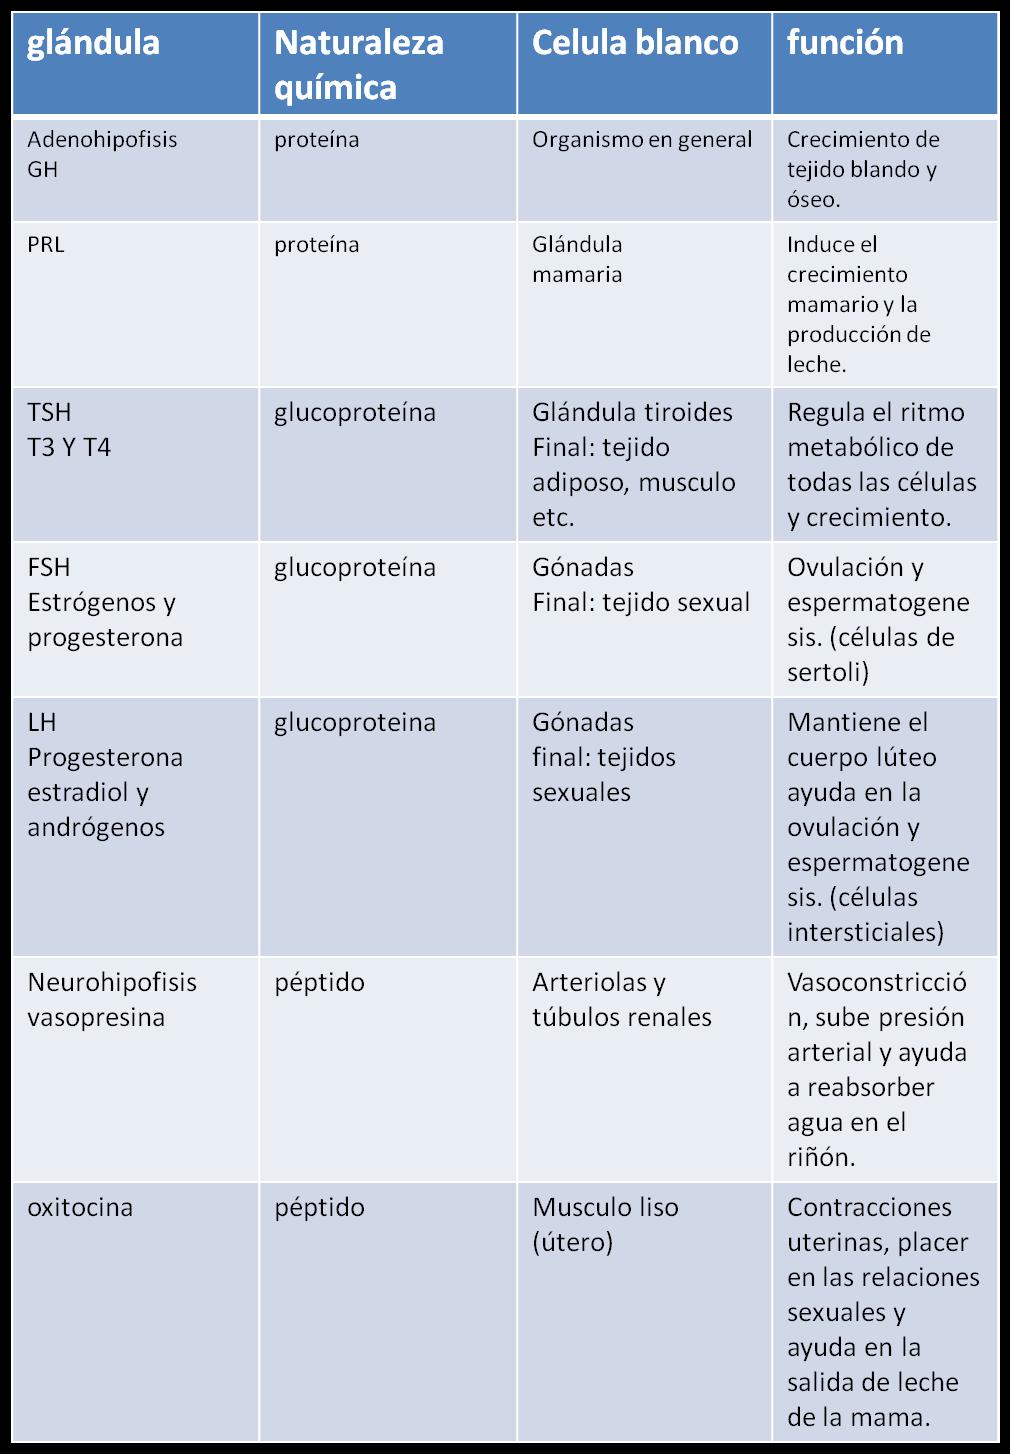 hormonas esteroideas anabolicas